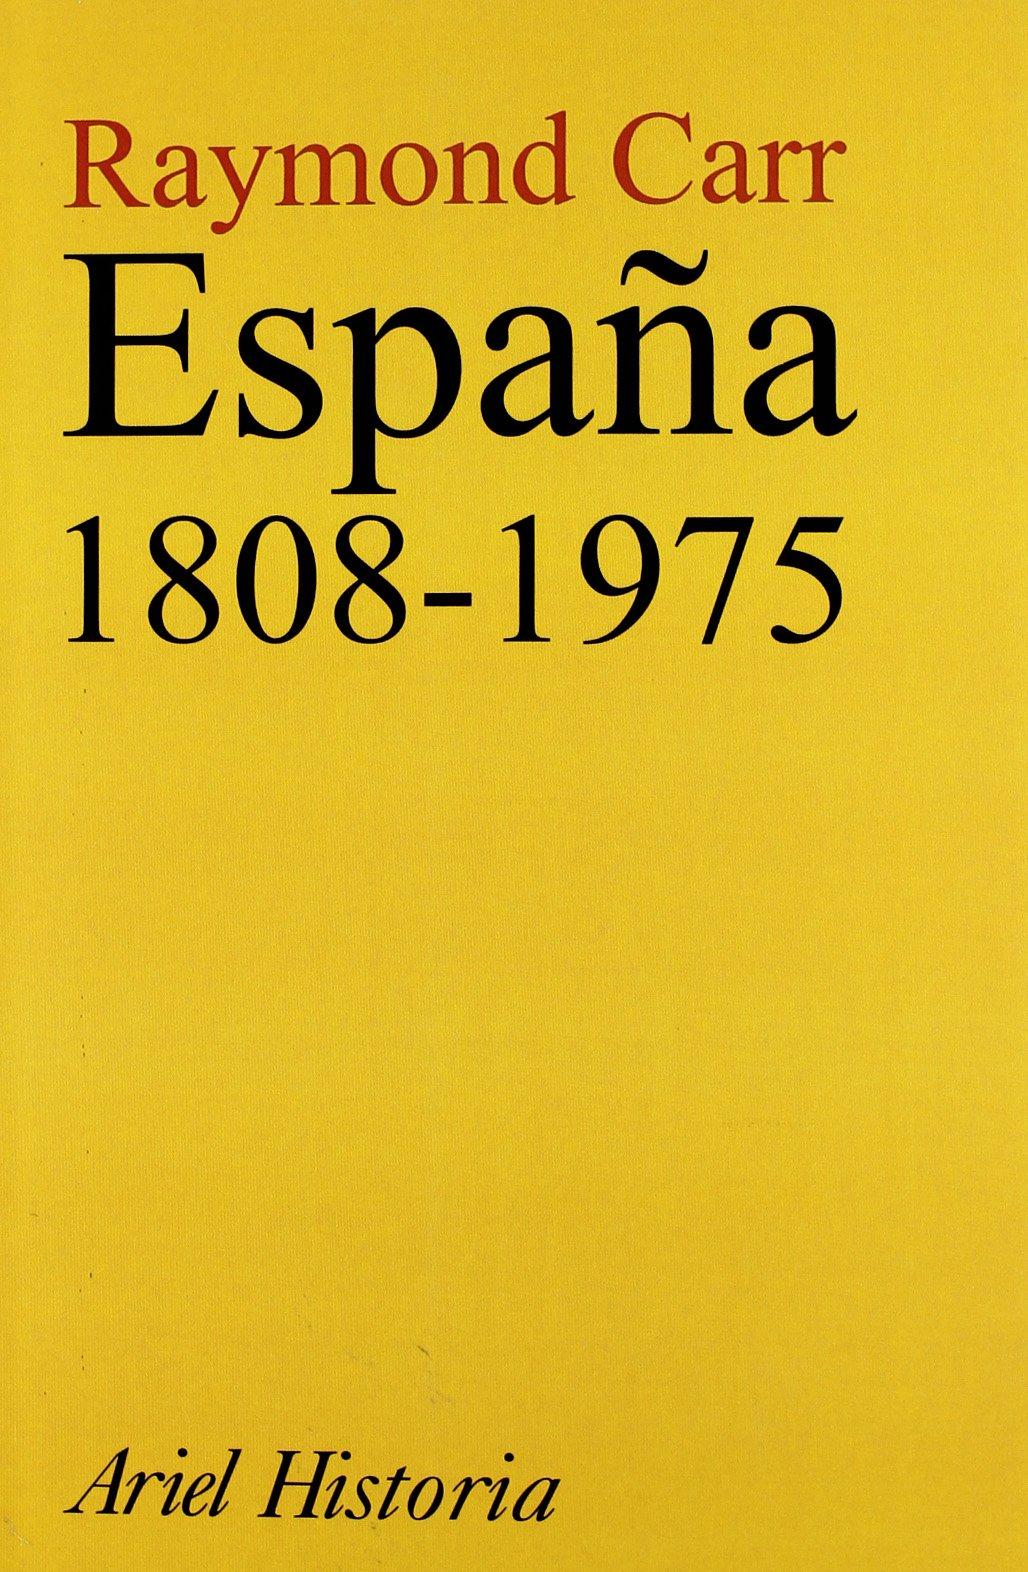 España, 1808-1975 (Ariel Historia): Amazon.es: Carr, Raymond: Libros